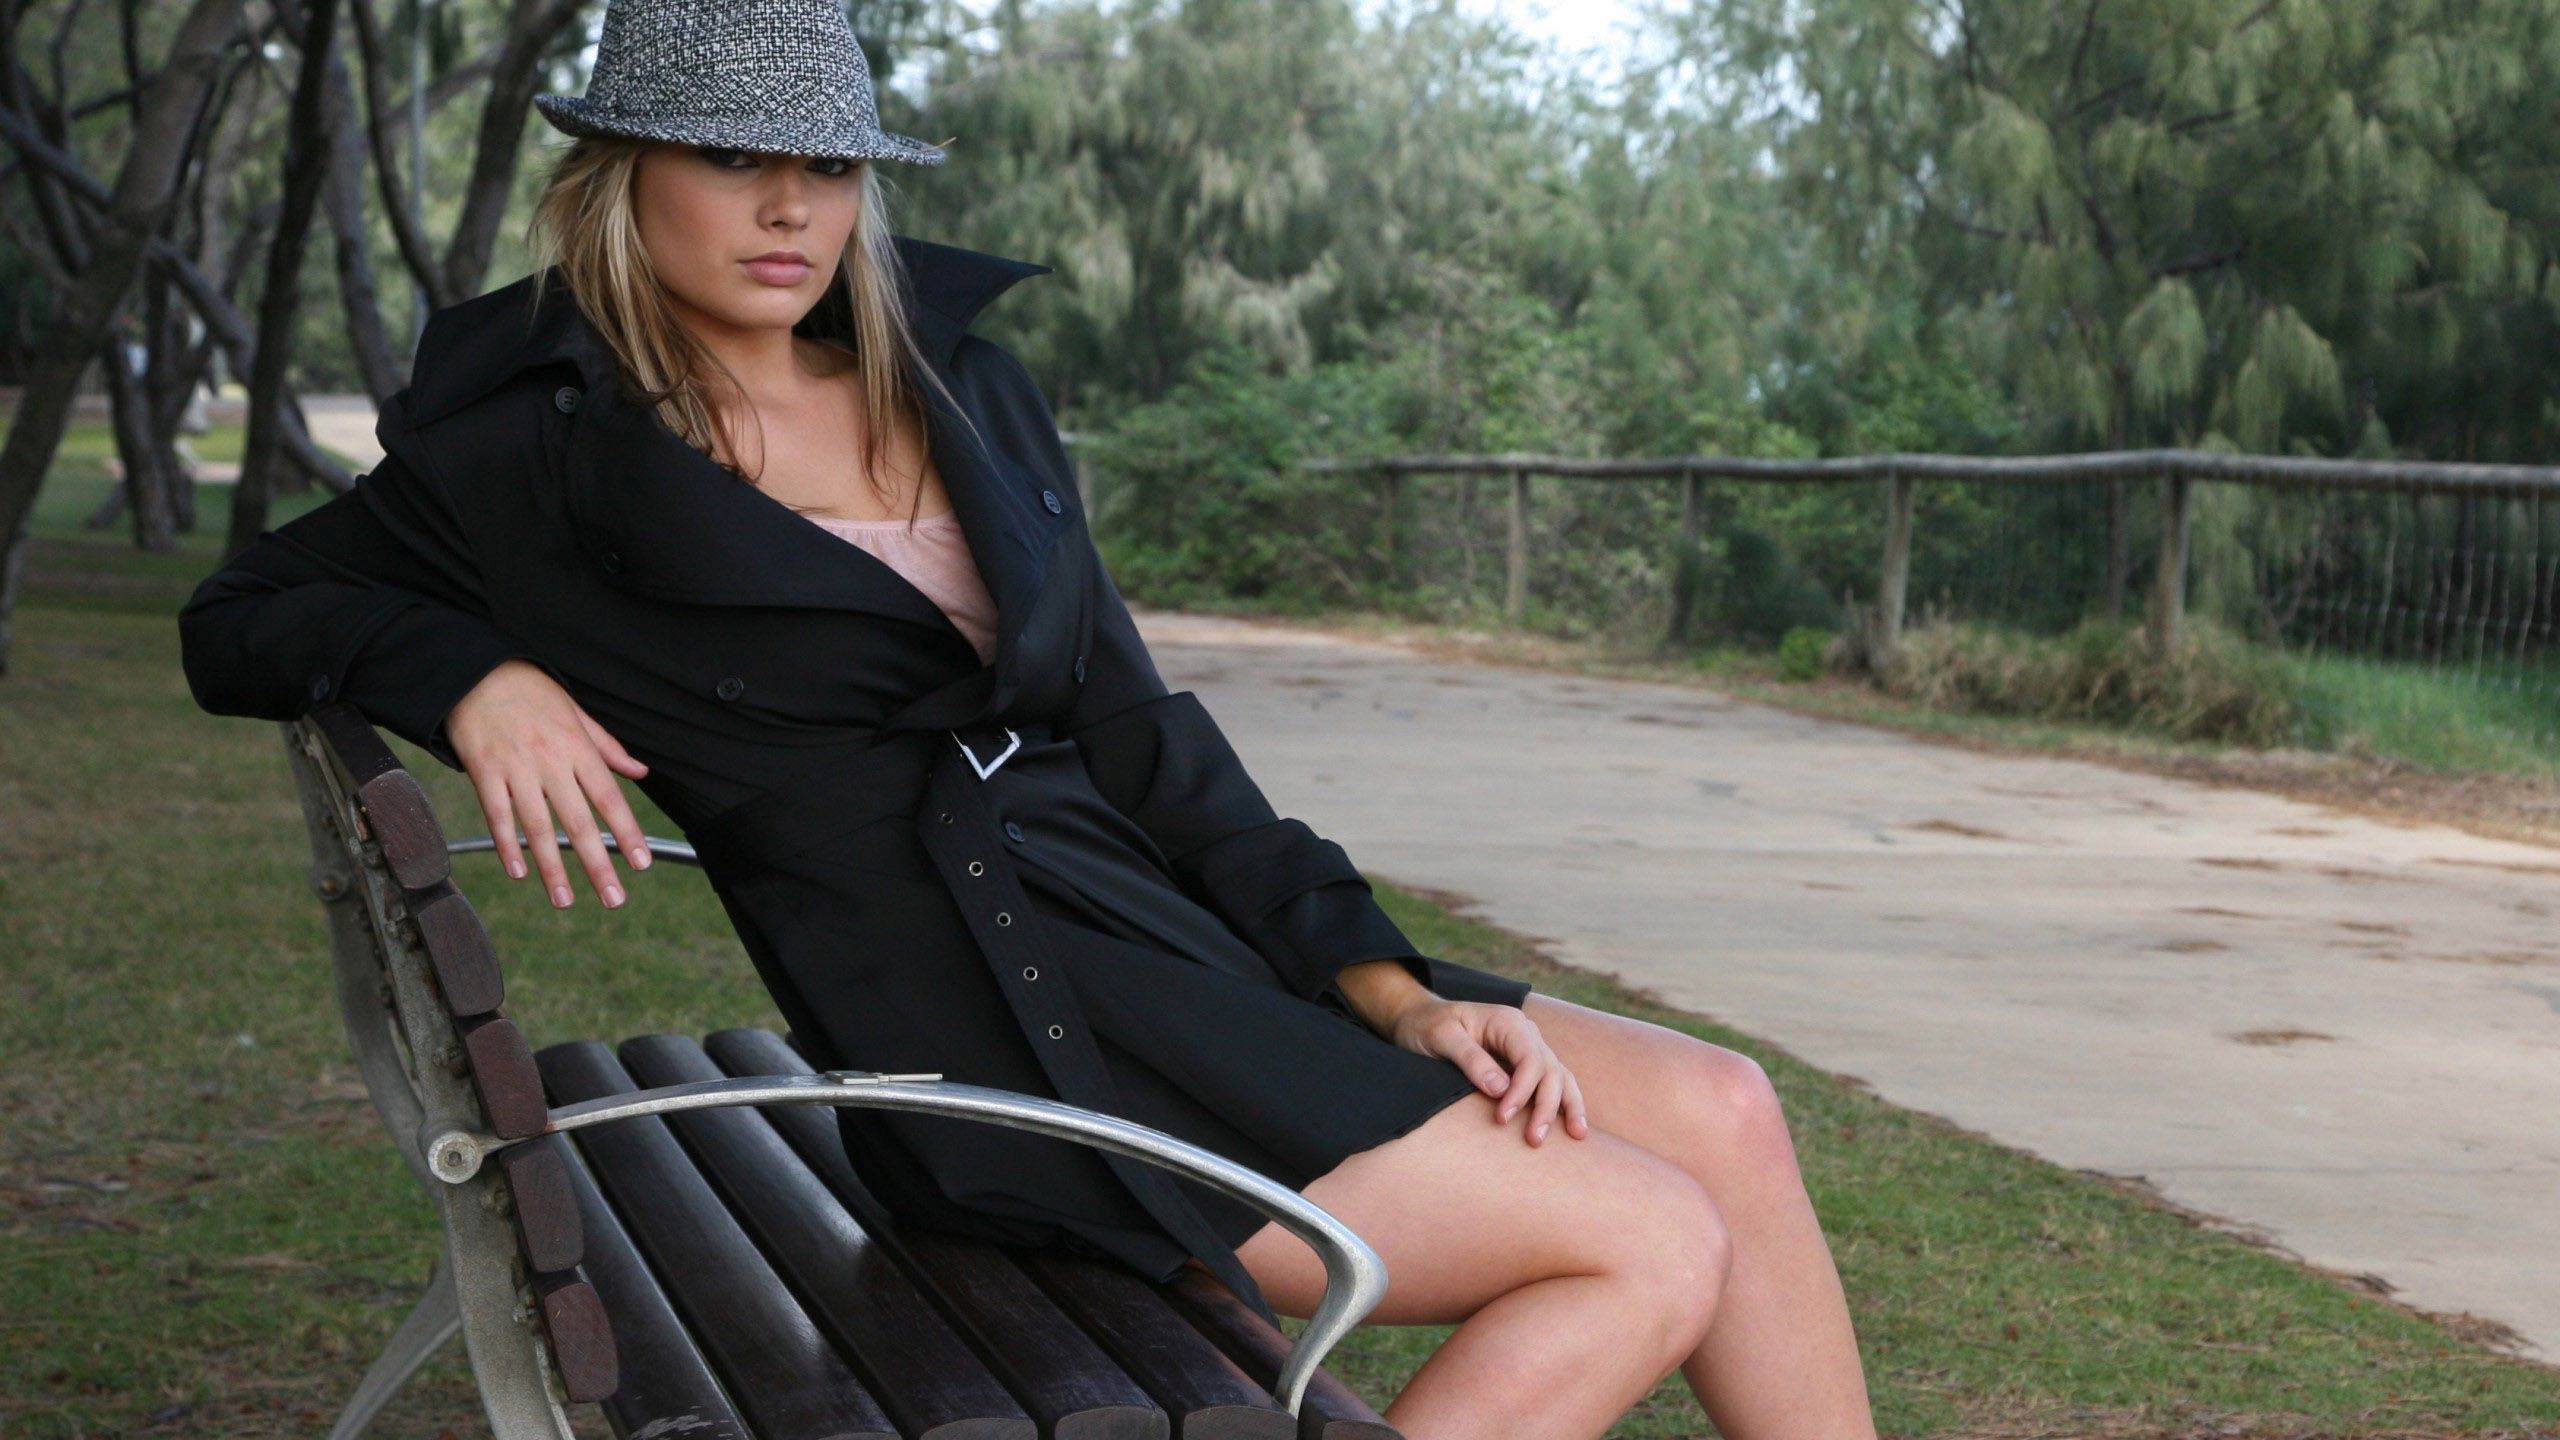 margot-robbie-hot-image-in-lingerie